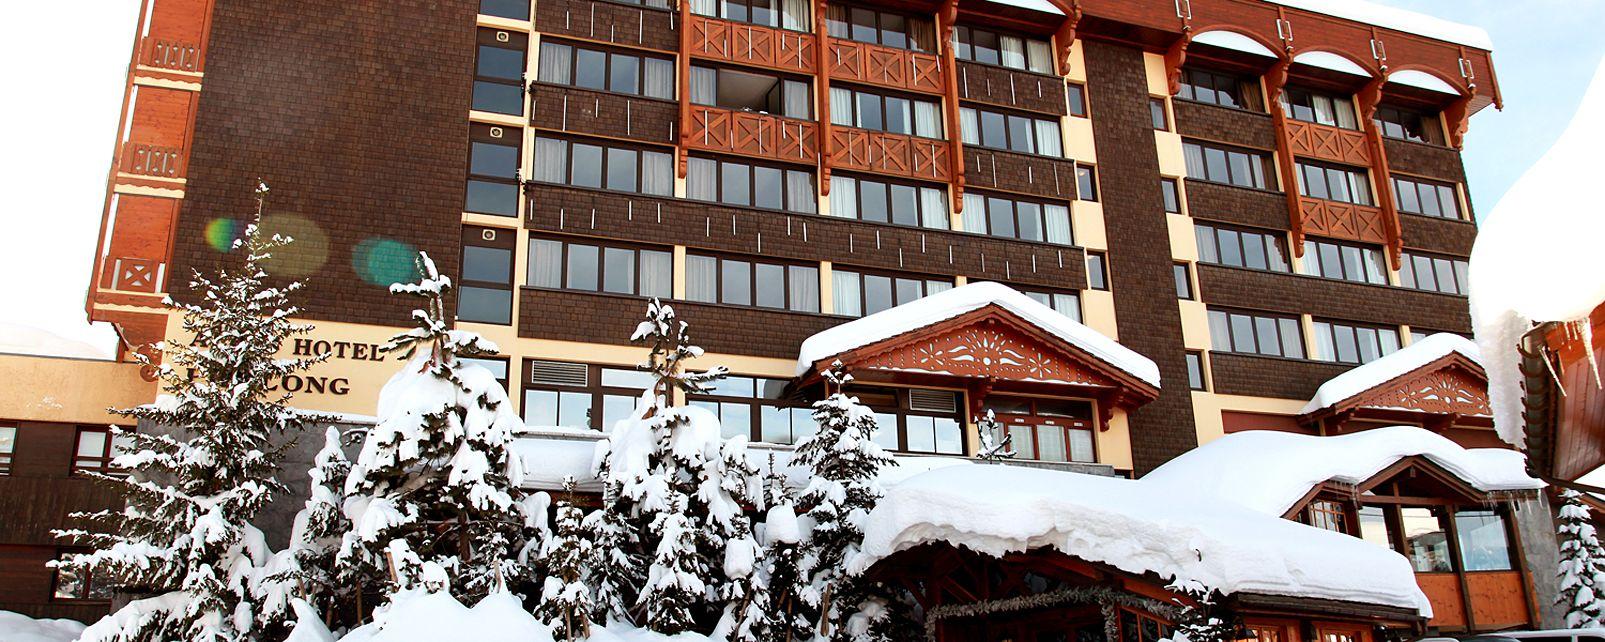 Hotel Le Pralong